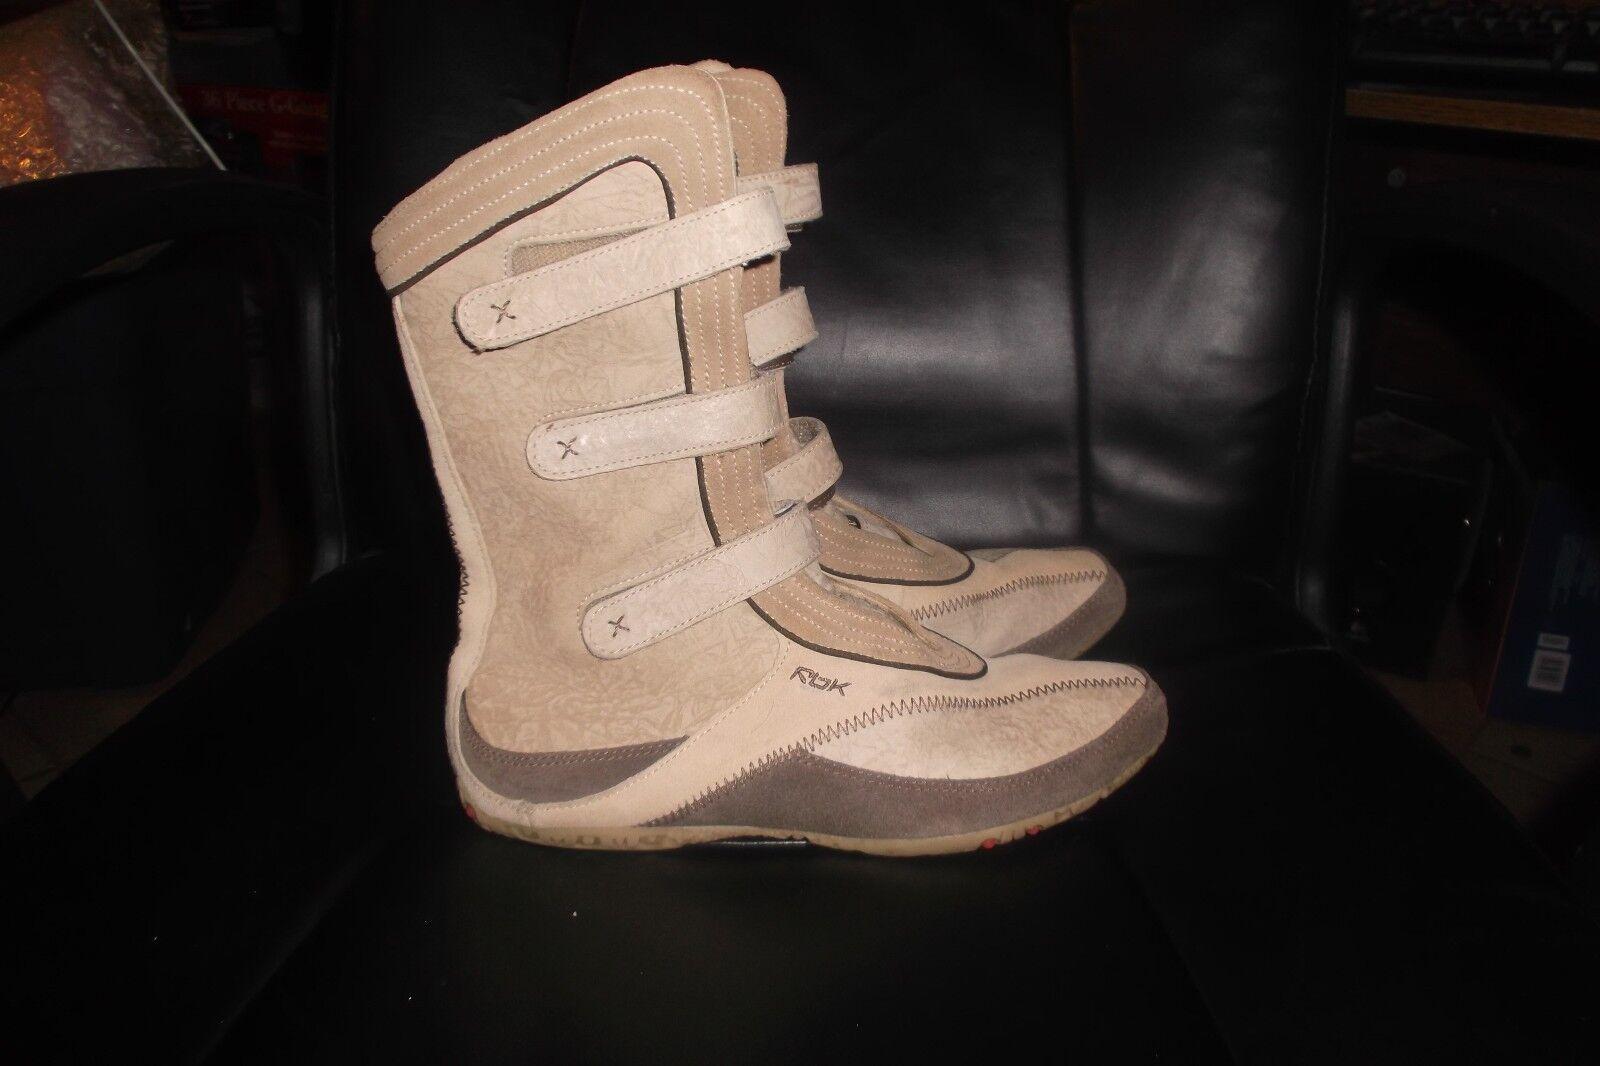 Reebok Womens Coyote Leather KOZAKI Boots WHITE HEAT MID sz  7.5 velcro